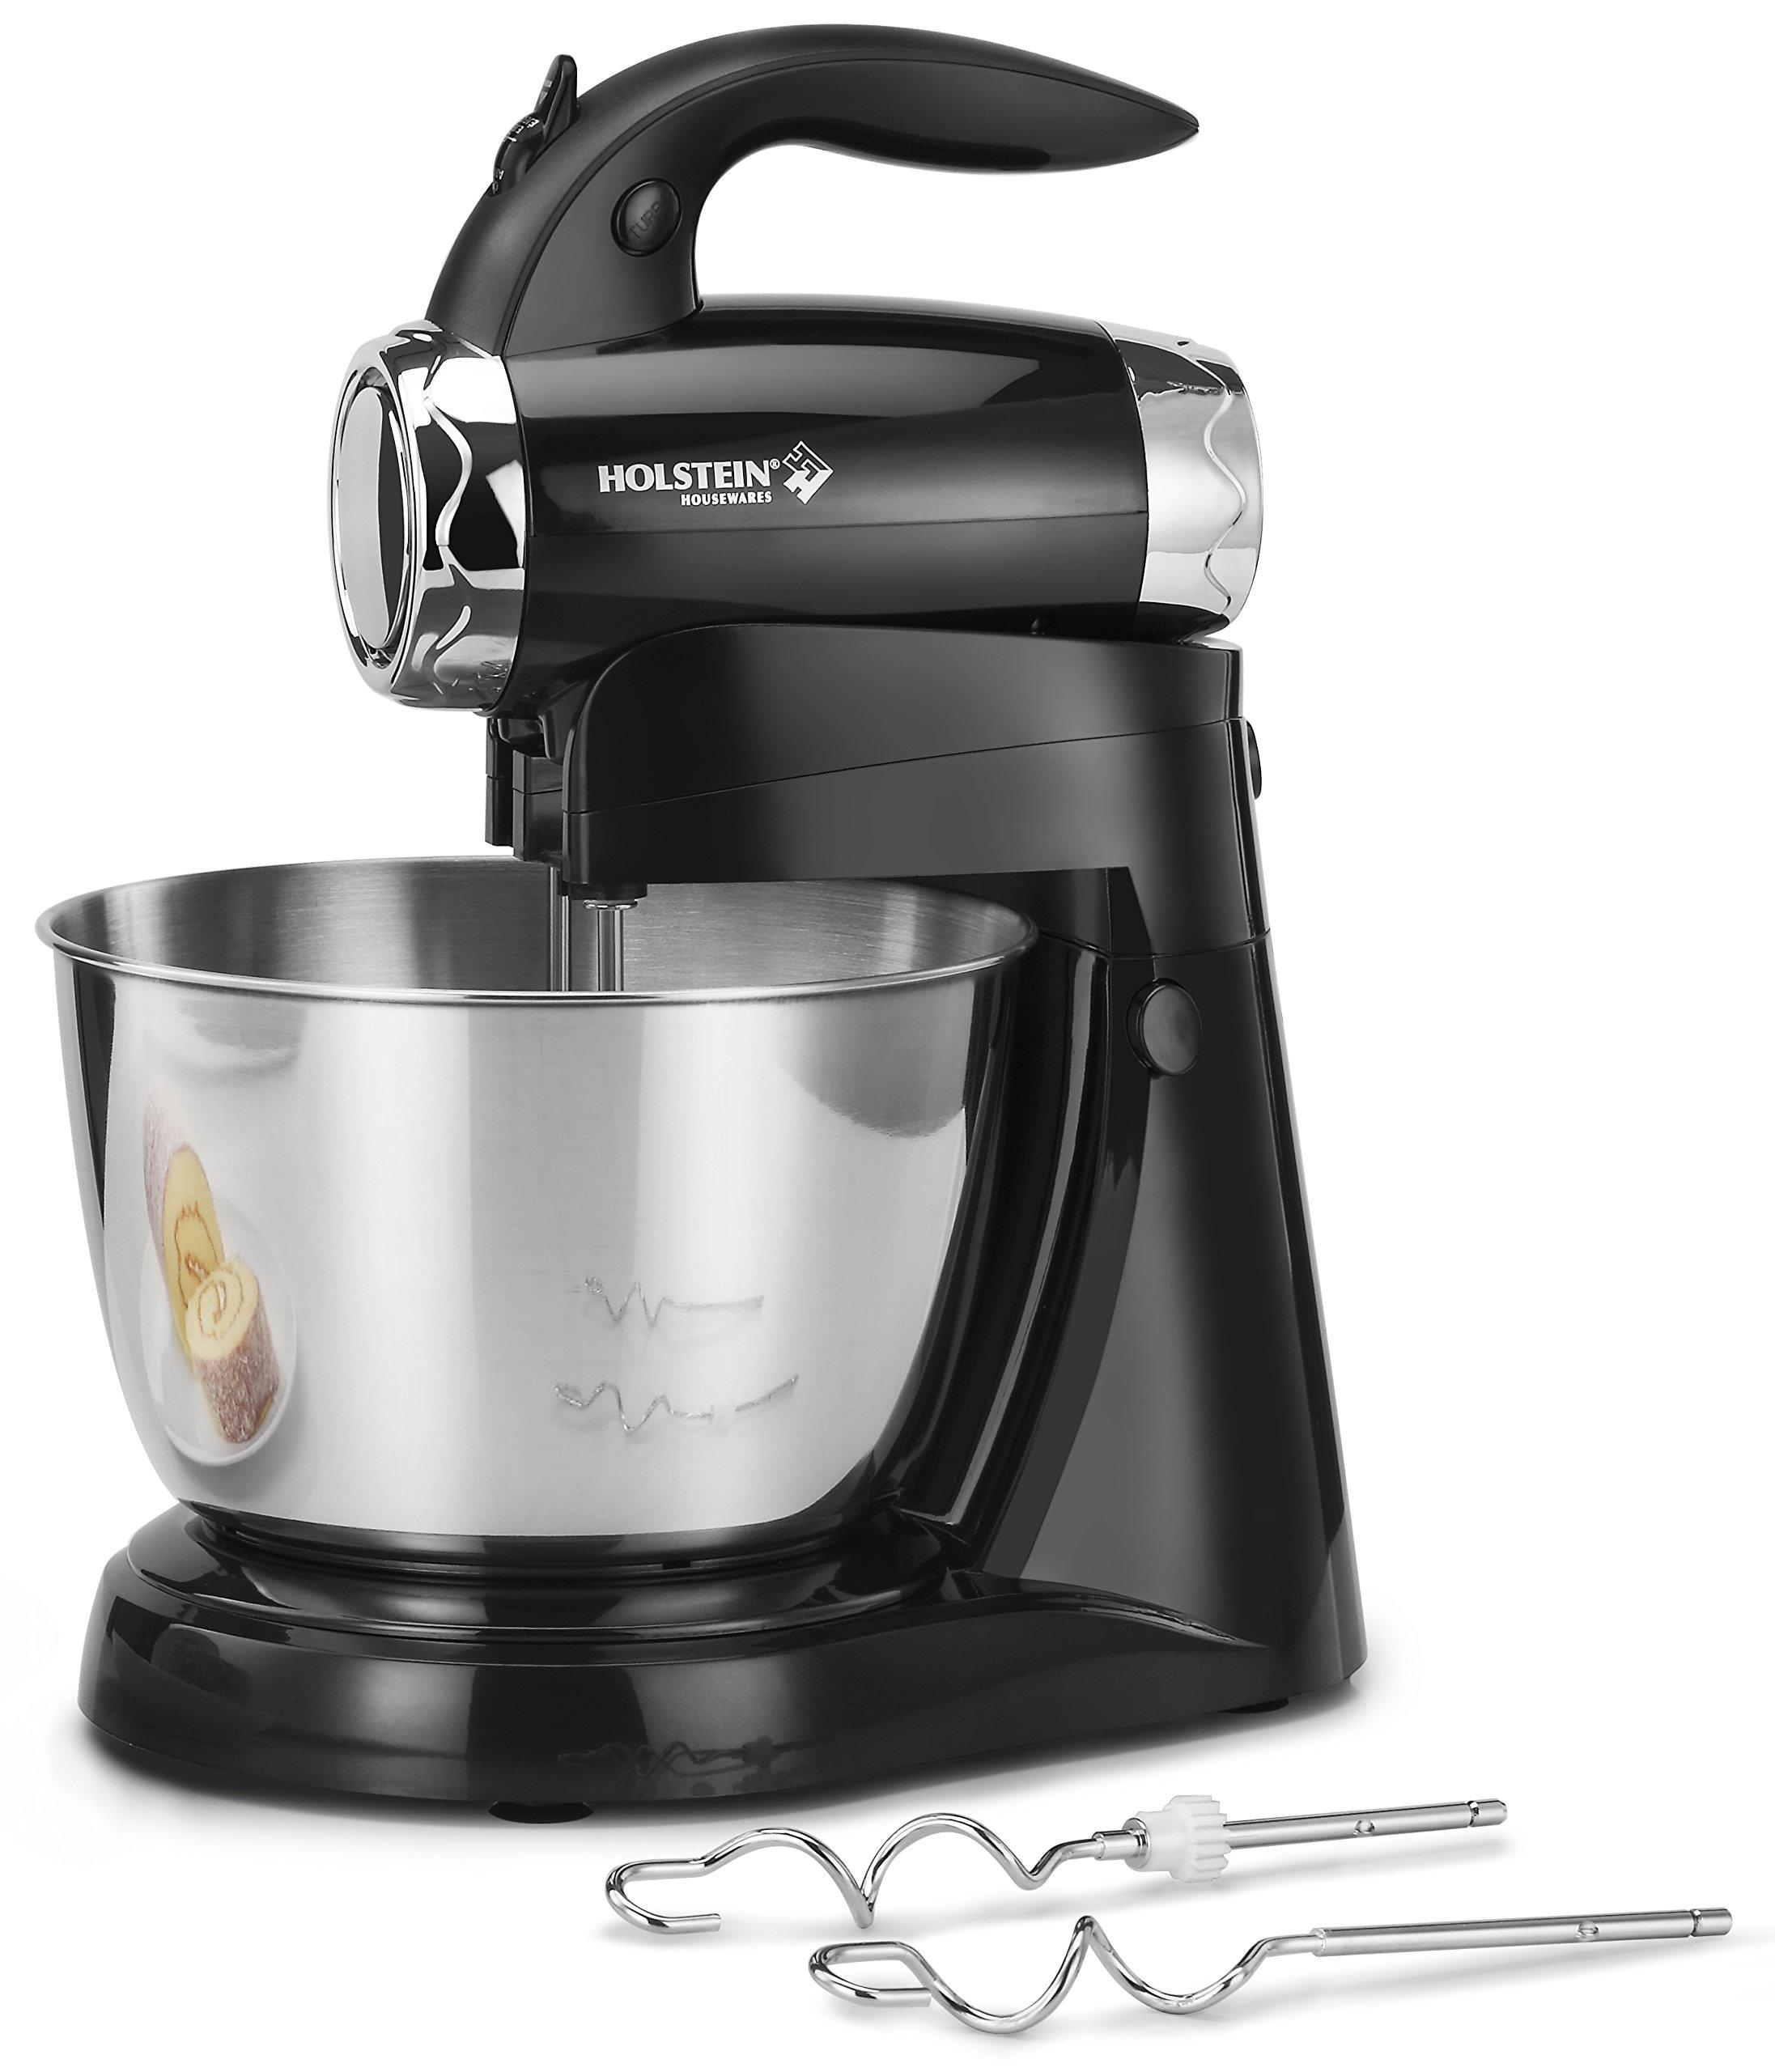 Holstein Housewares HH-09149005SS Hand/Stand Mixer, Black/Silver